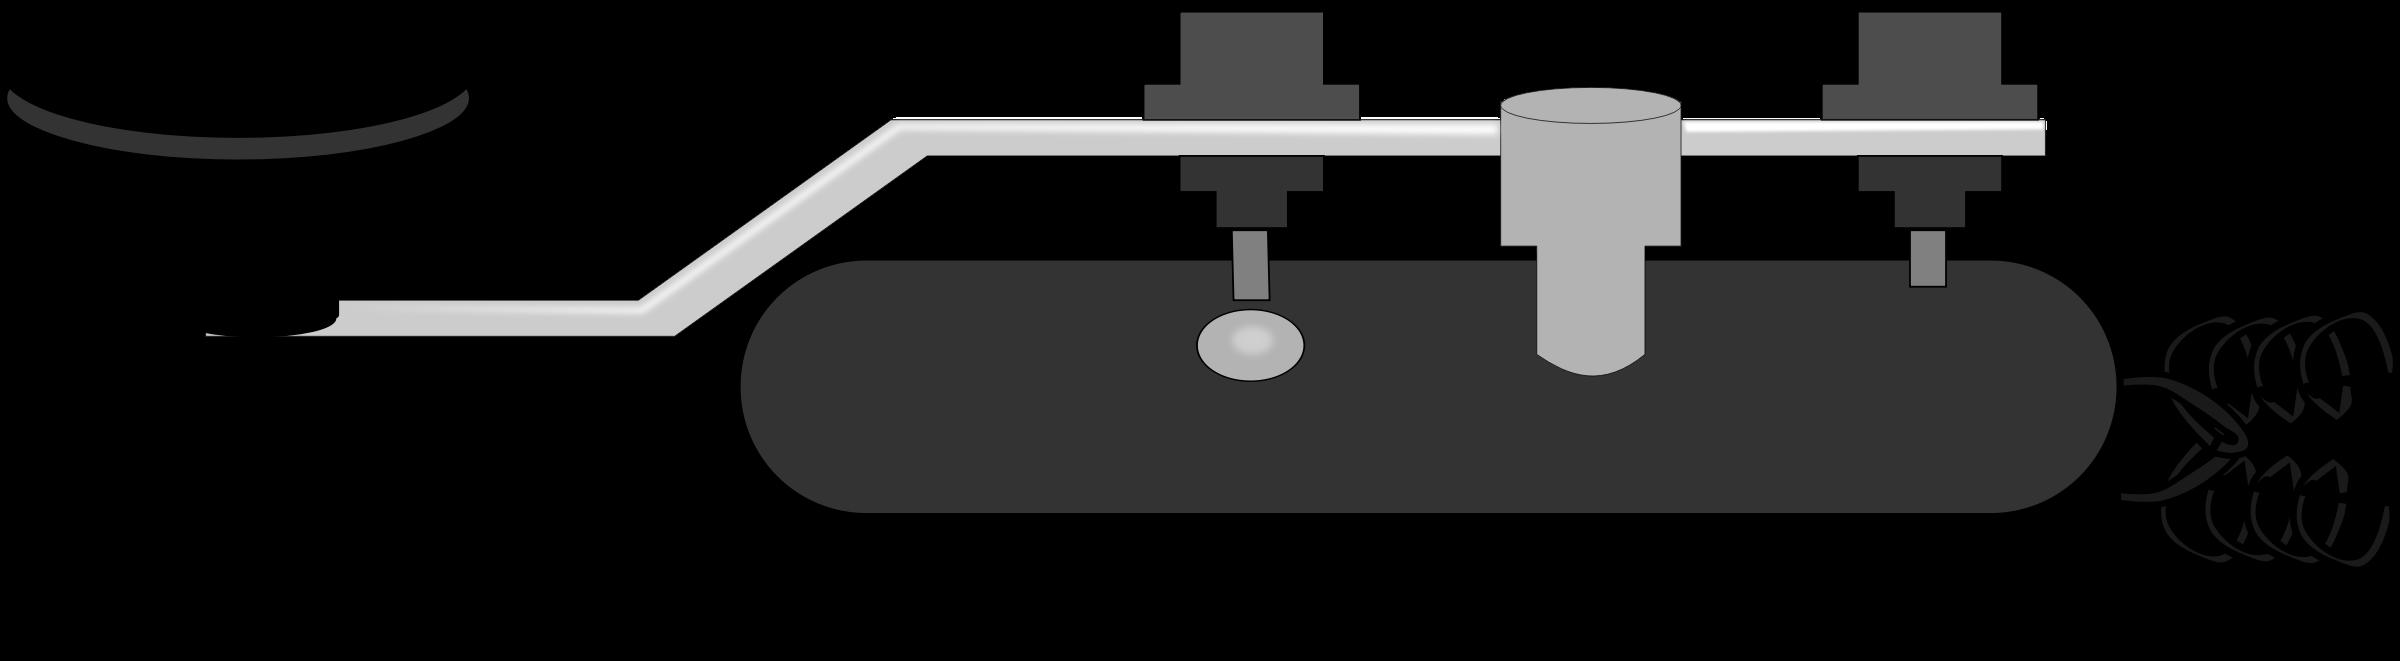 Code clipart morse code Clipart Morse Code Code Morse